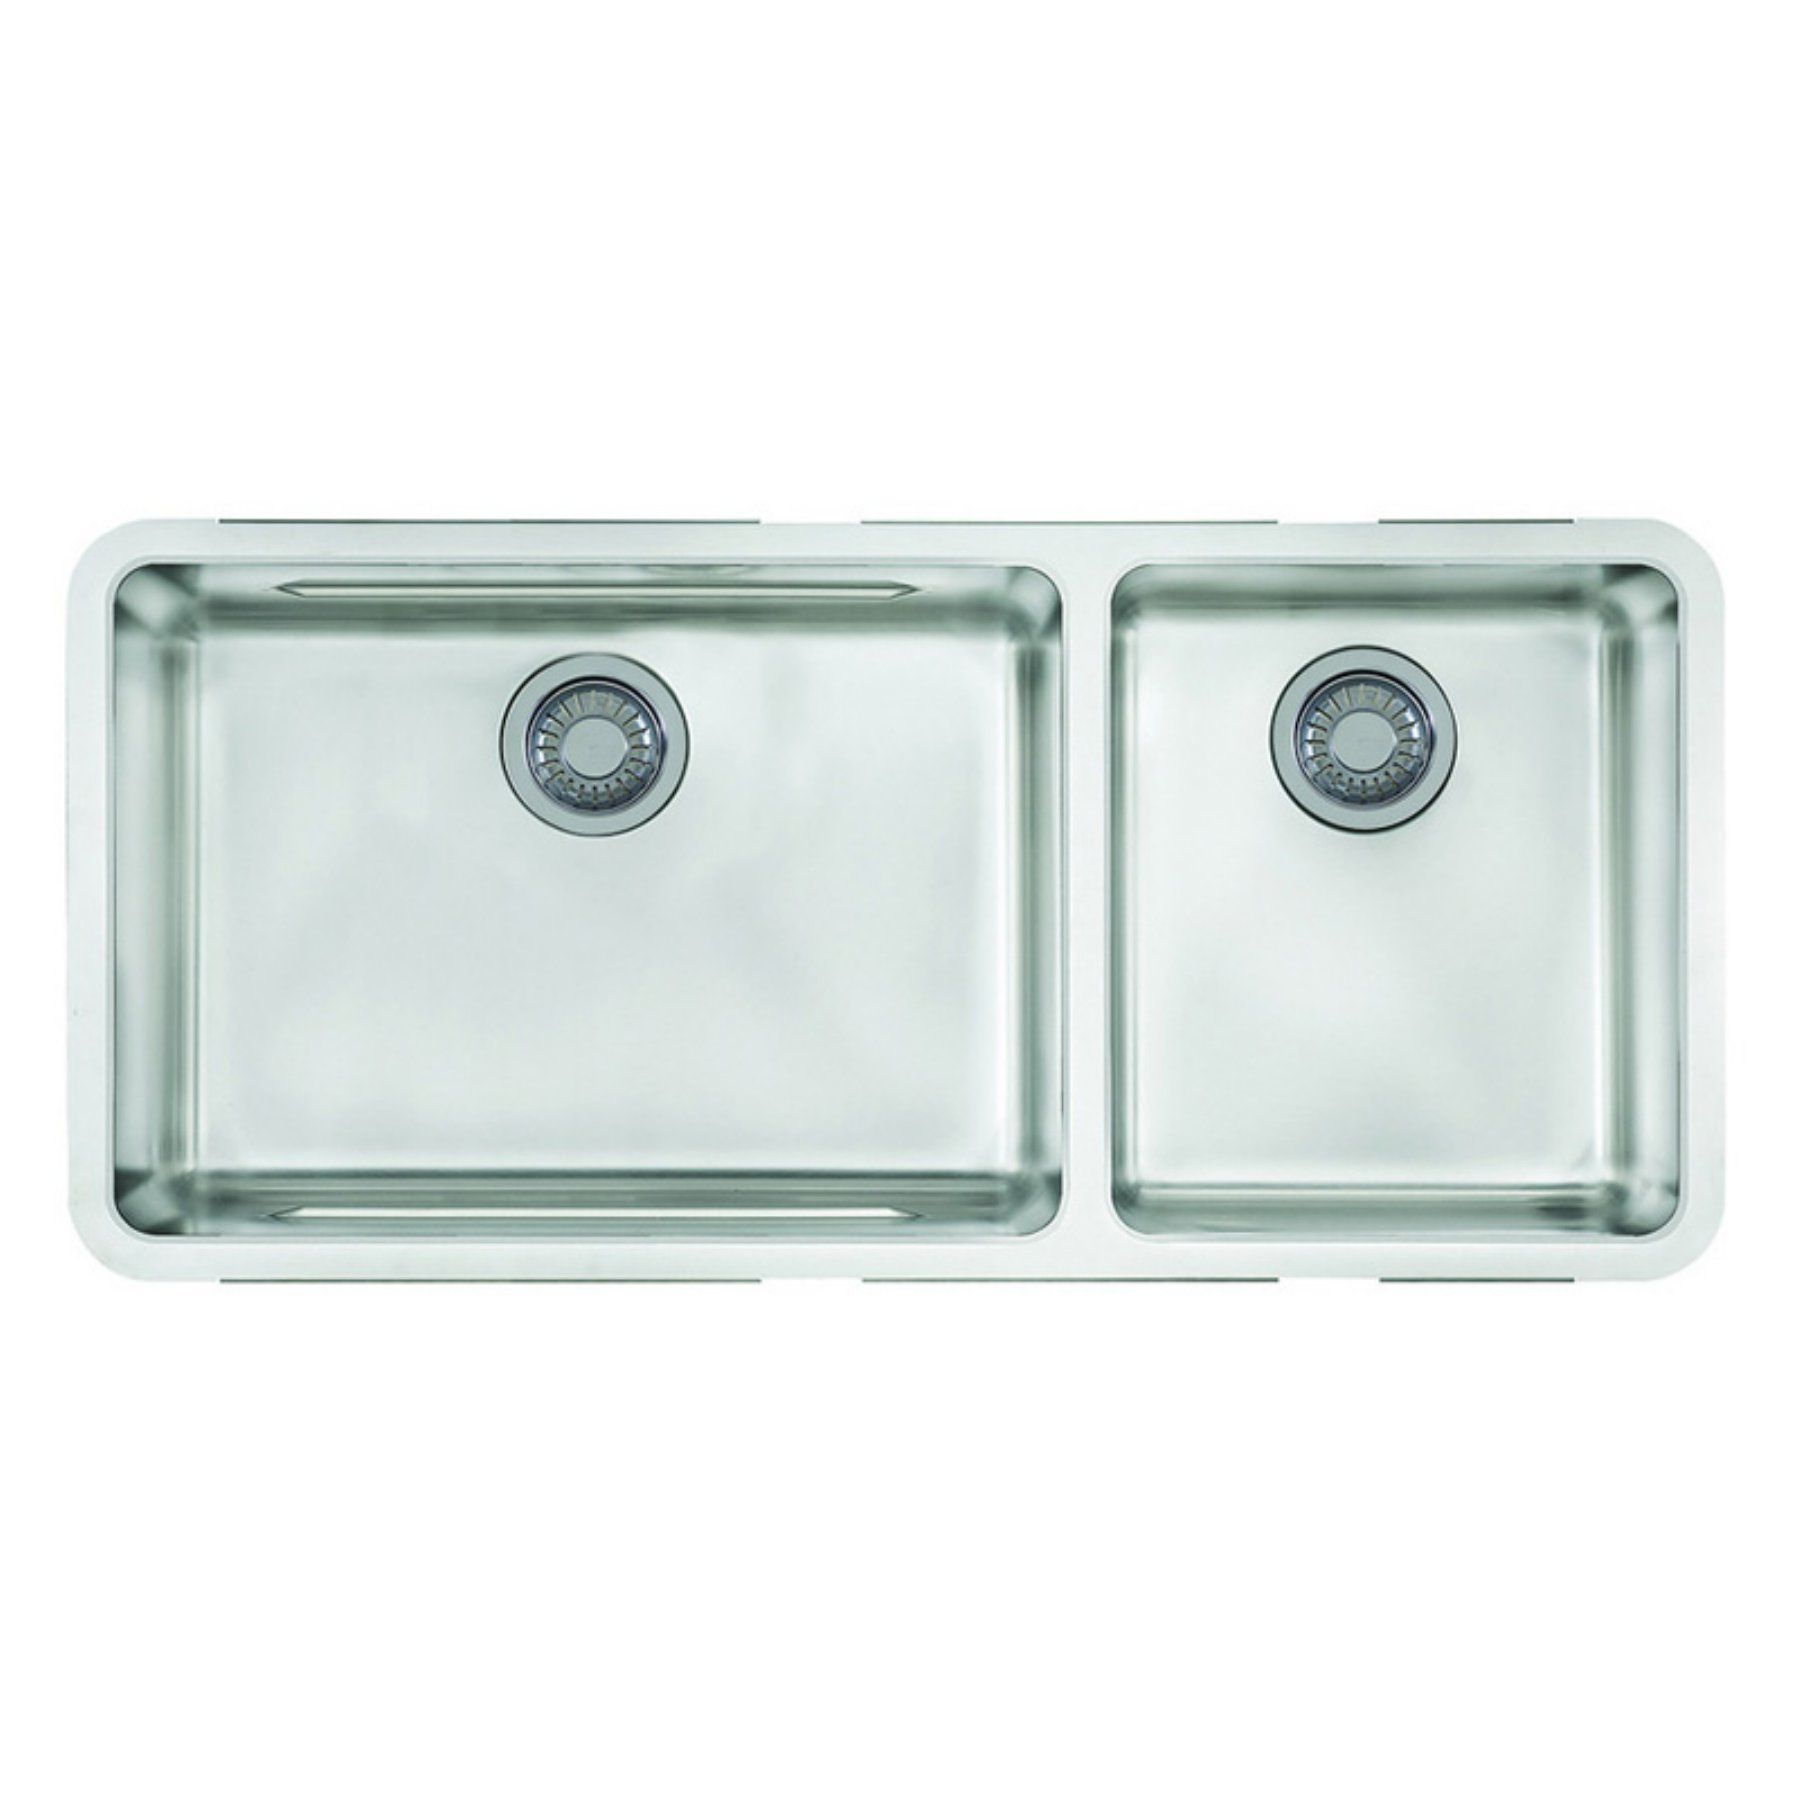 Franke Usa Kubus Kbx12039 Undermount Kitchen Sink Sink Double